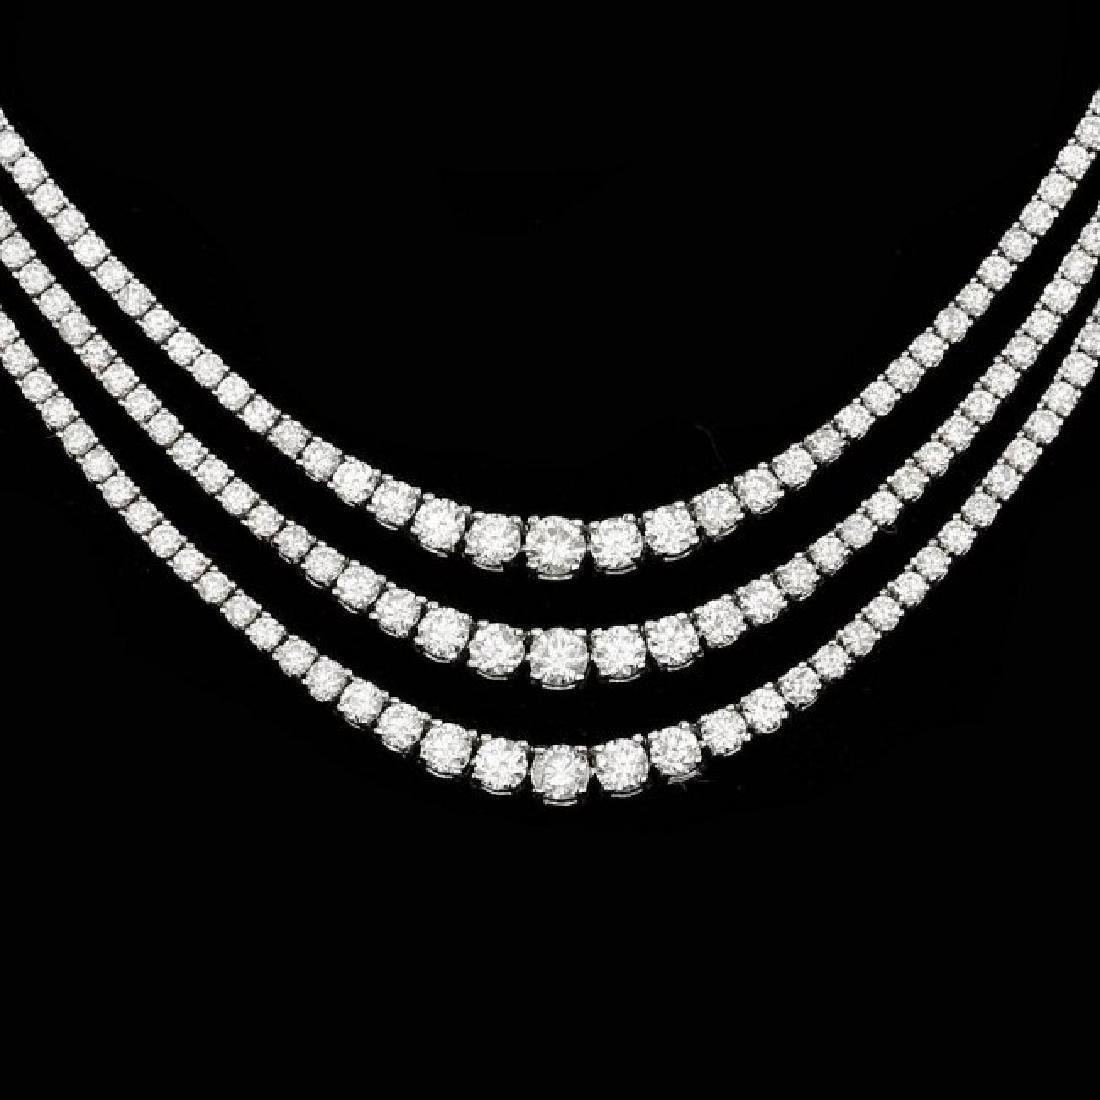 18k White Gold 12.60ct Diamond Necklace - 2